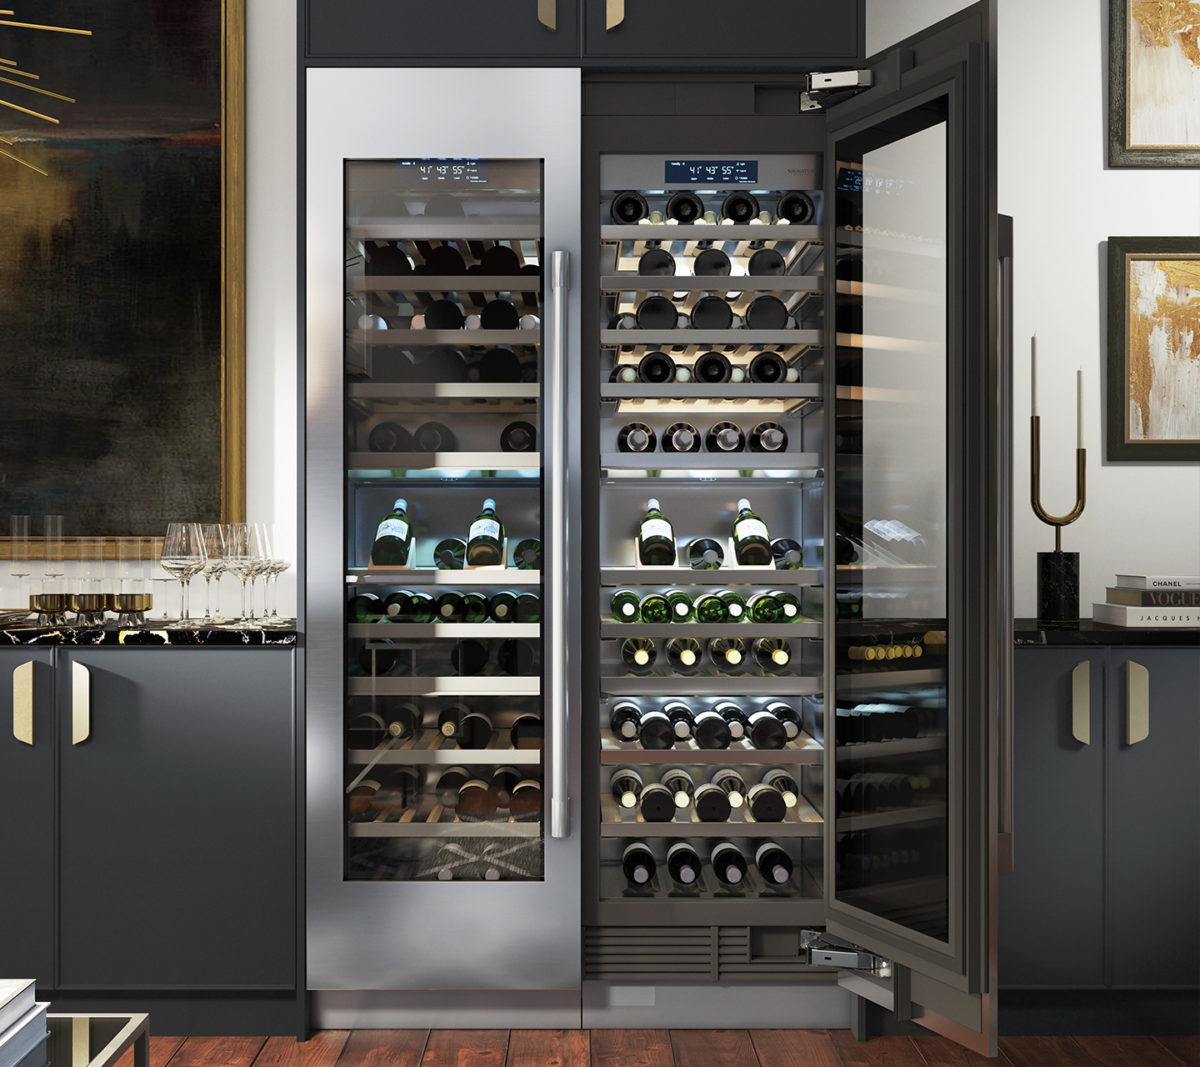 SKS Wine refrigerator columns